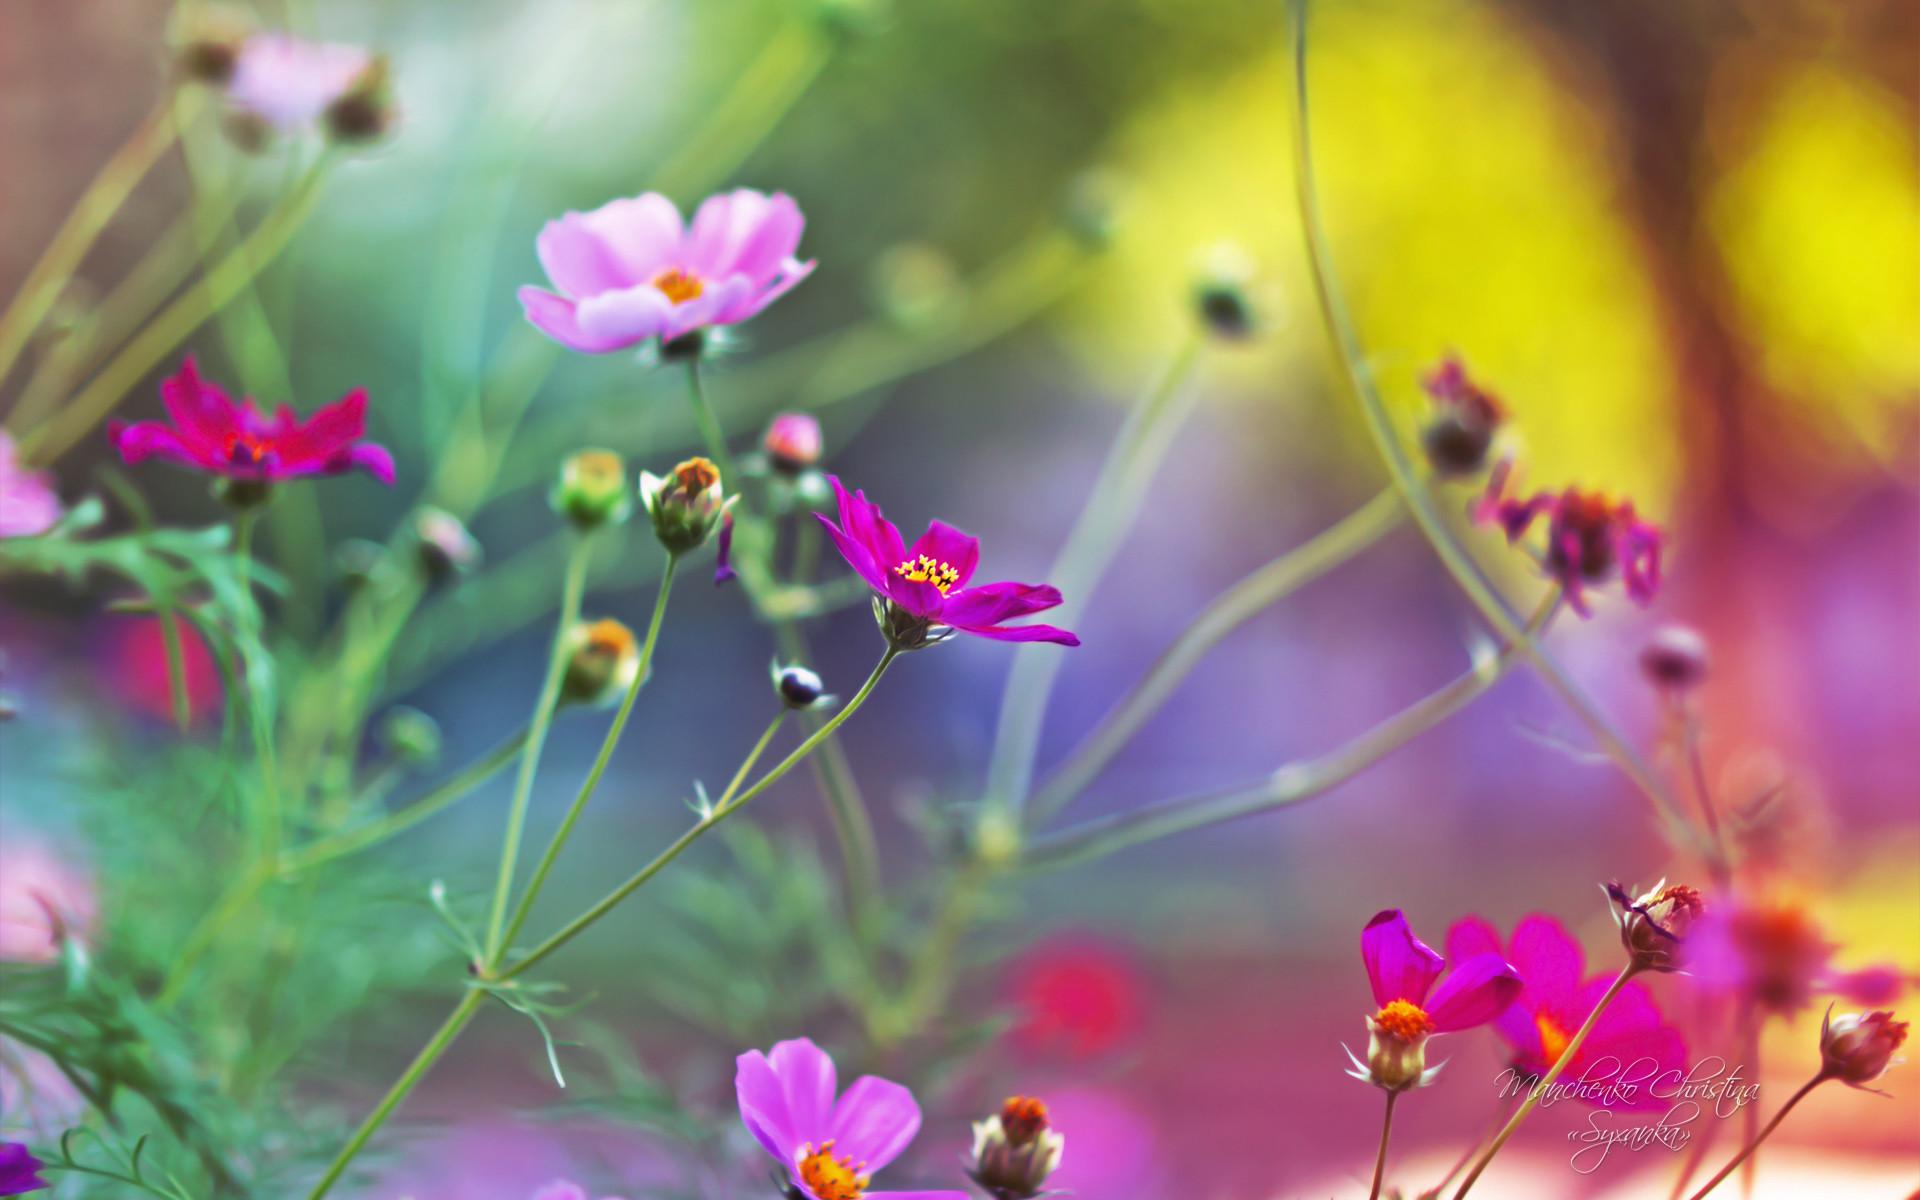 Amazing Flowers wallpaper jpg x desktop wallpaper 175352